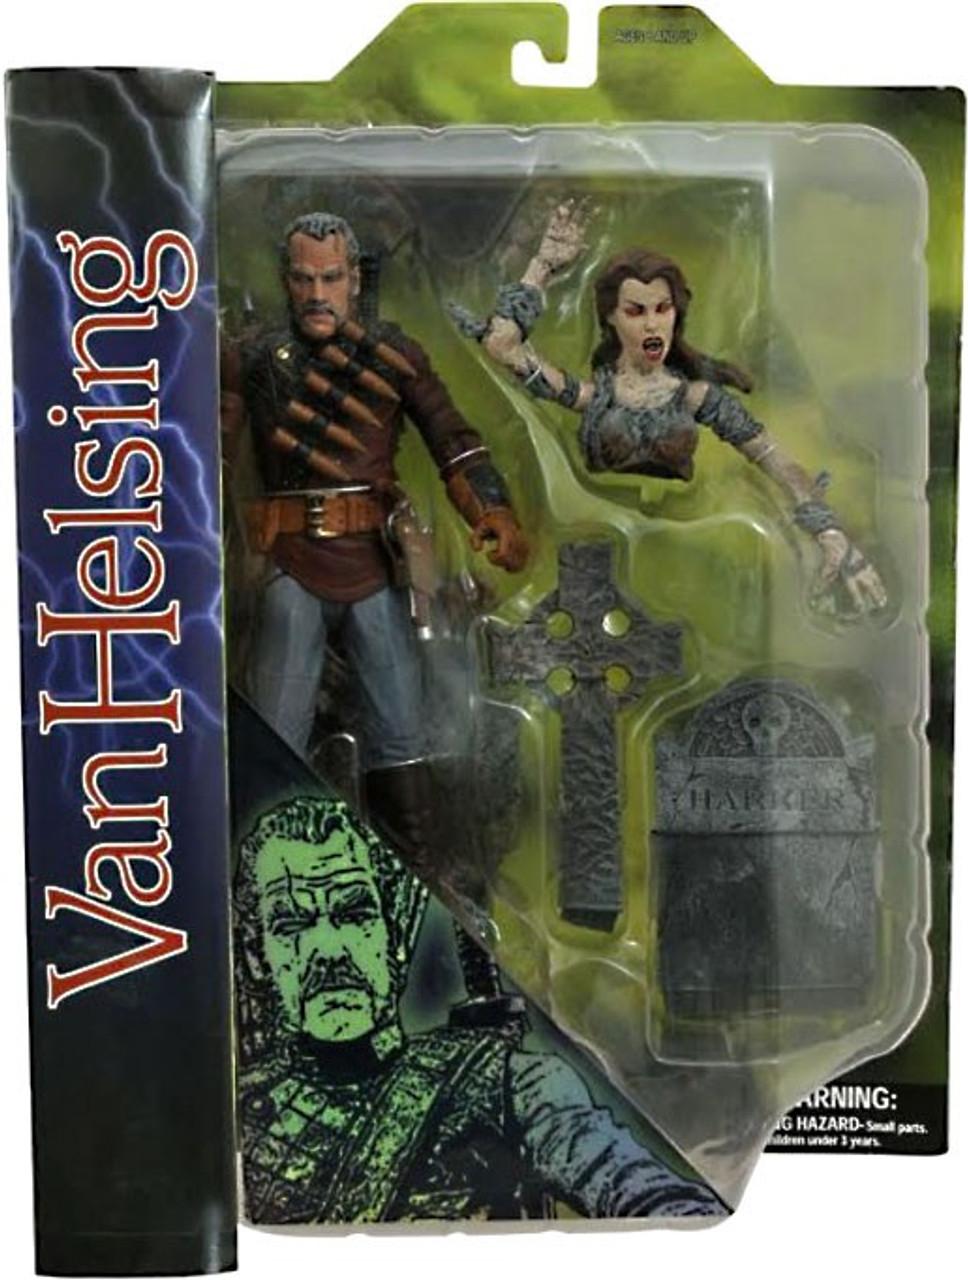 Universal Monsters Van Helsing Action Figure